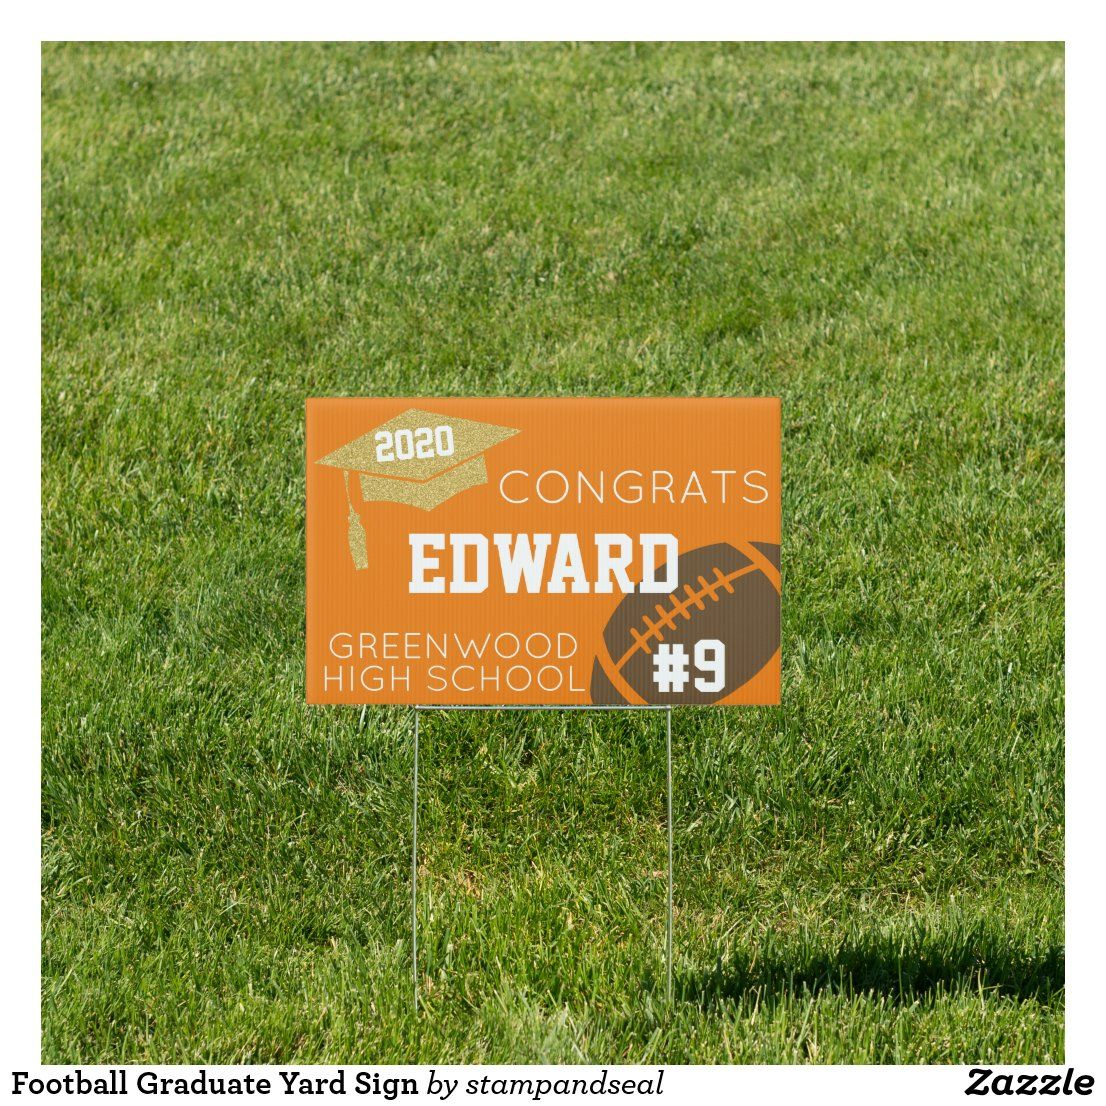 Football graduate yard sign in 2020 yard